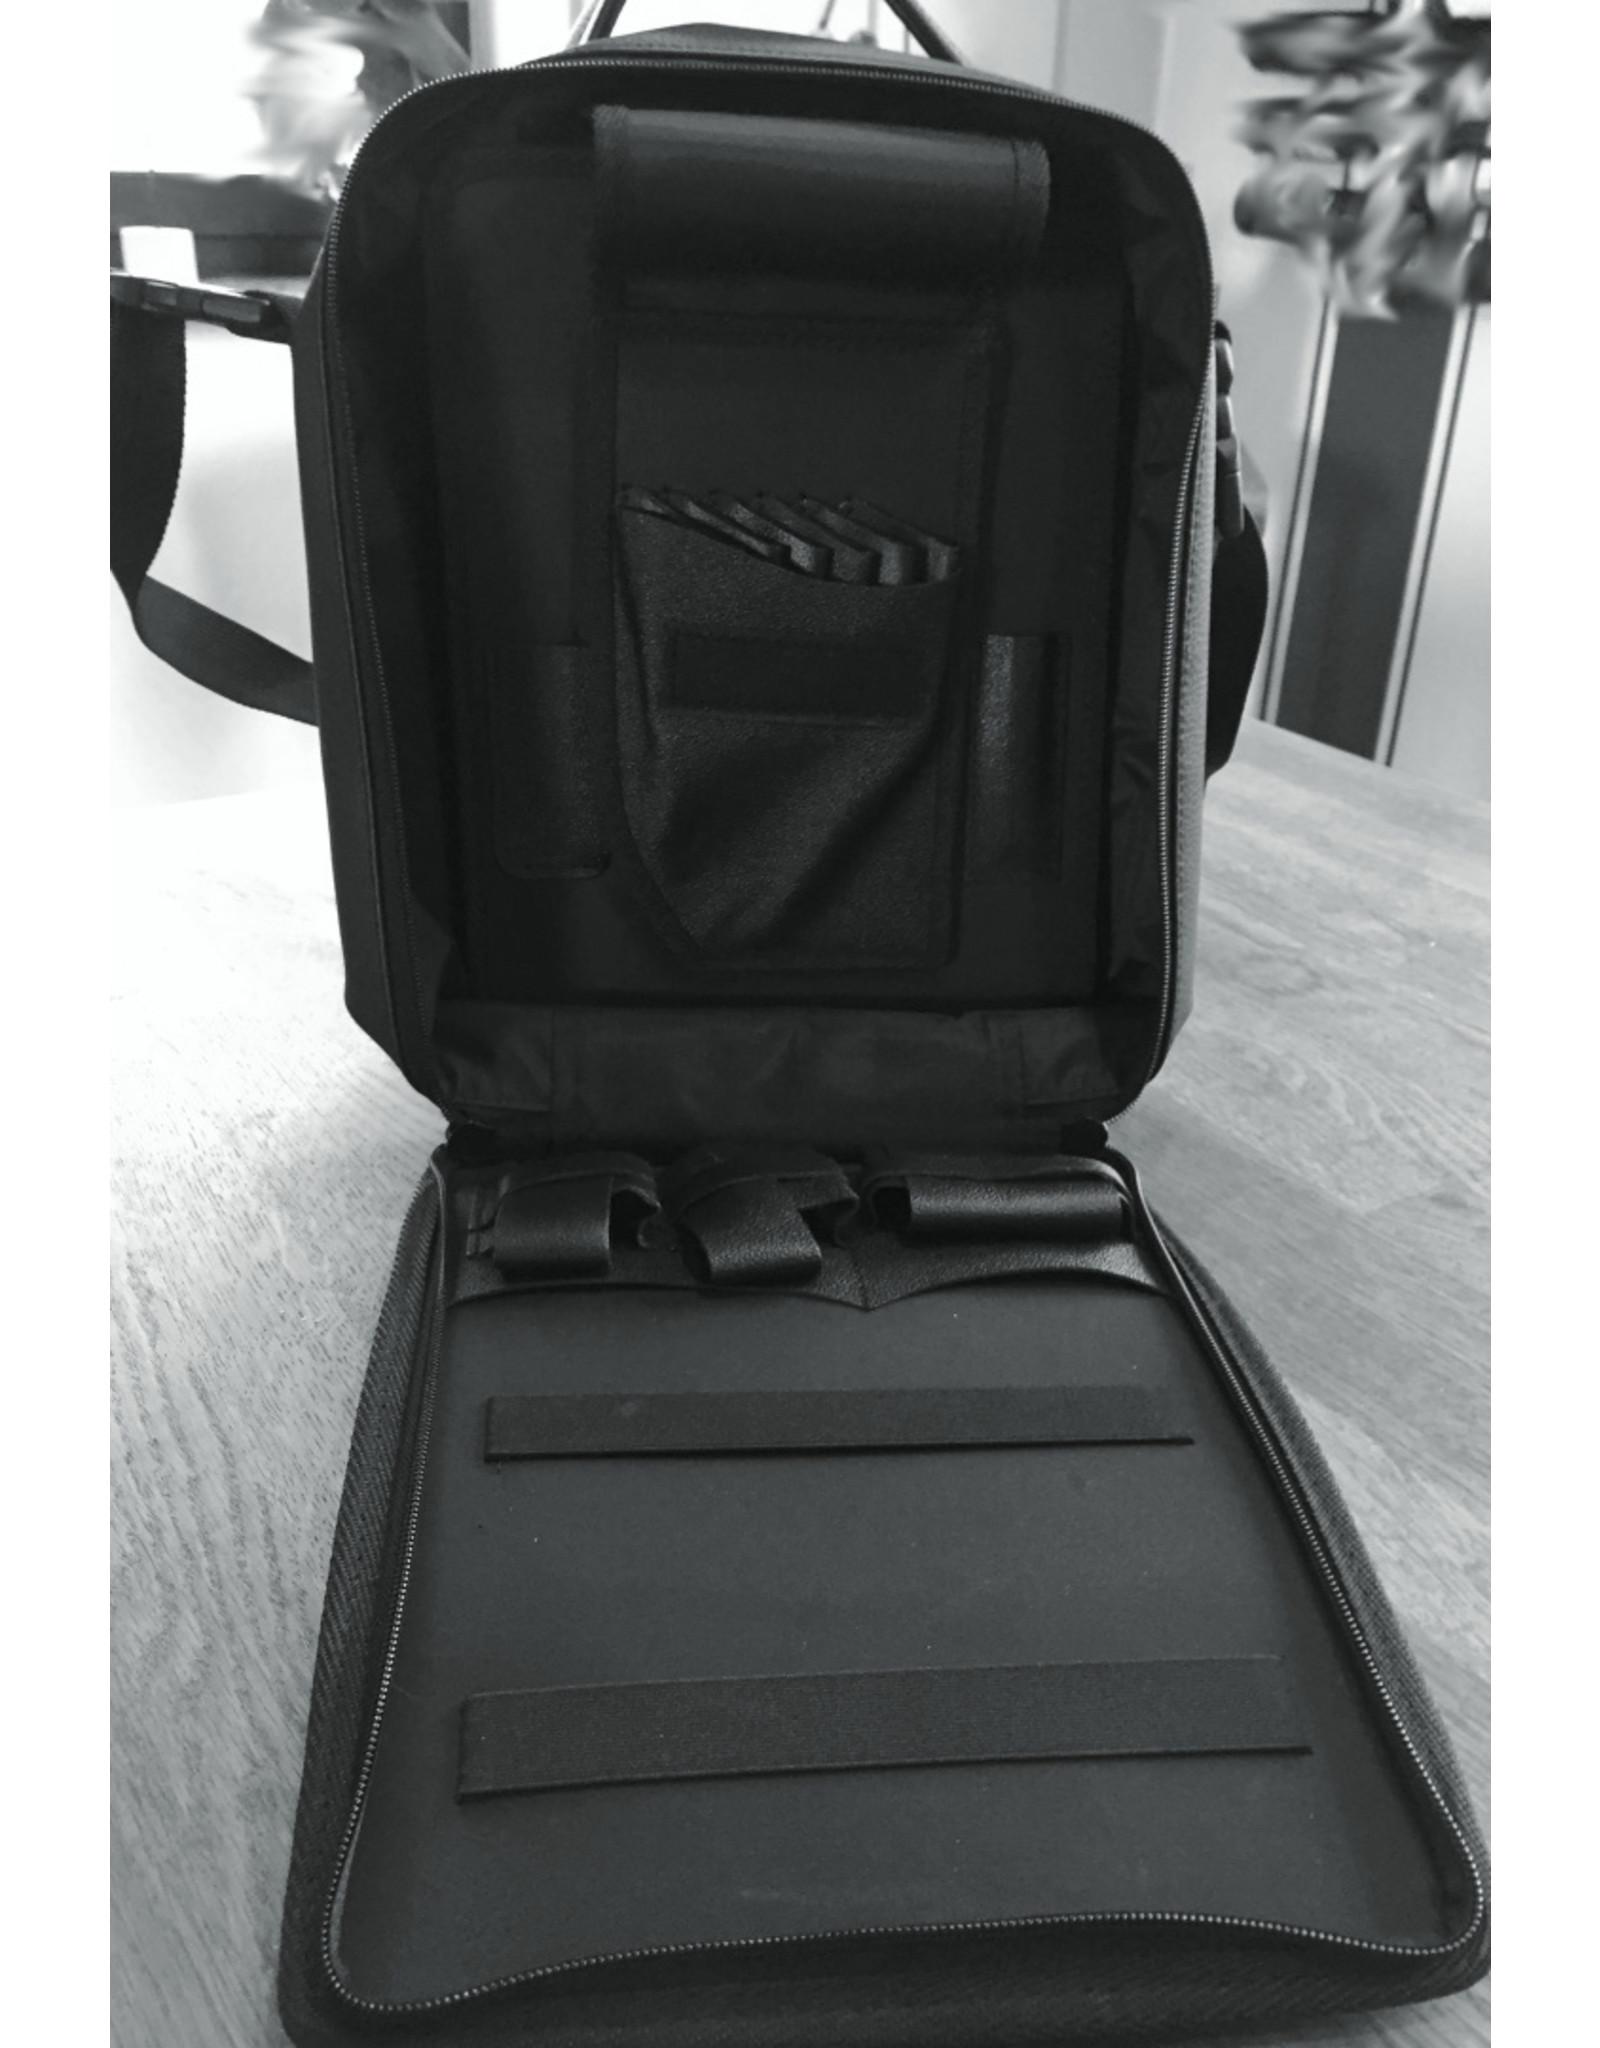 Kasho Made in Japan Kasho Tool Bag KTB gross Farbe schwarz